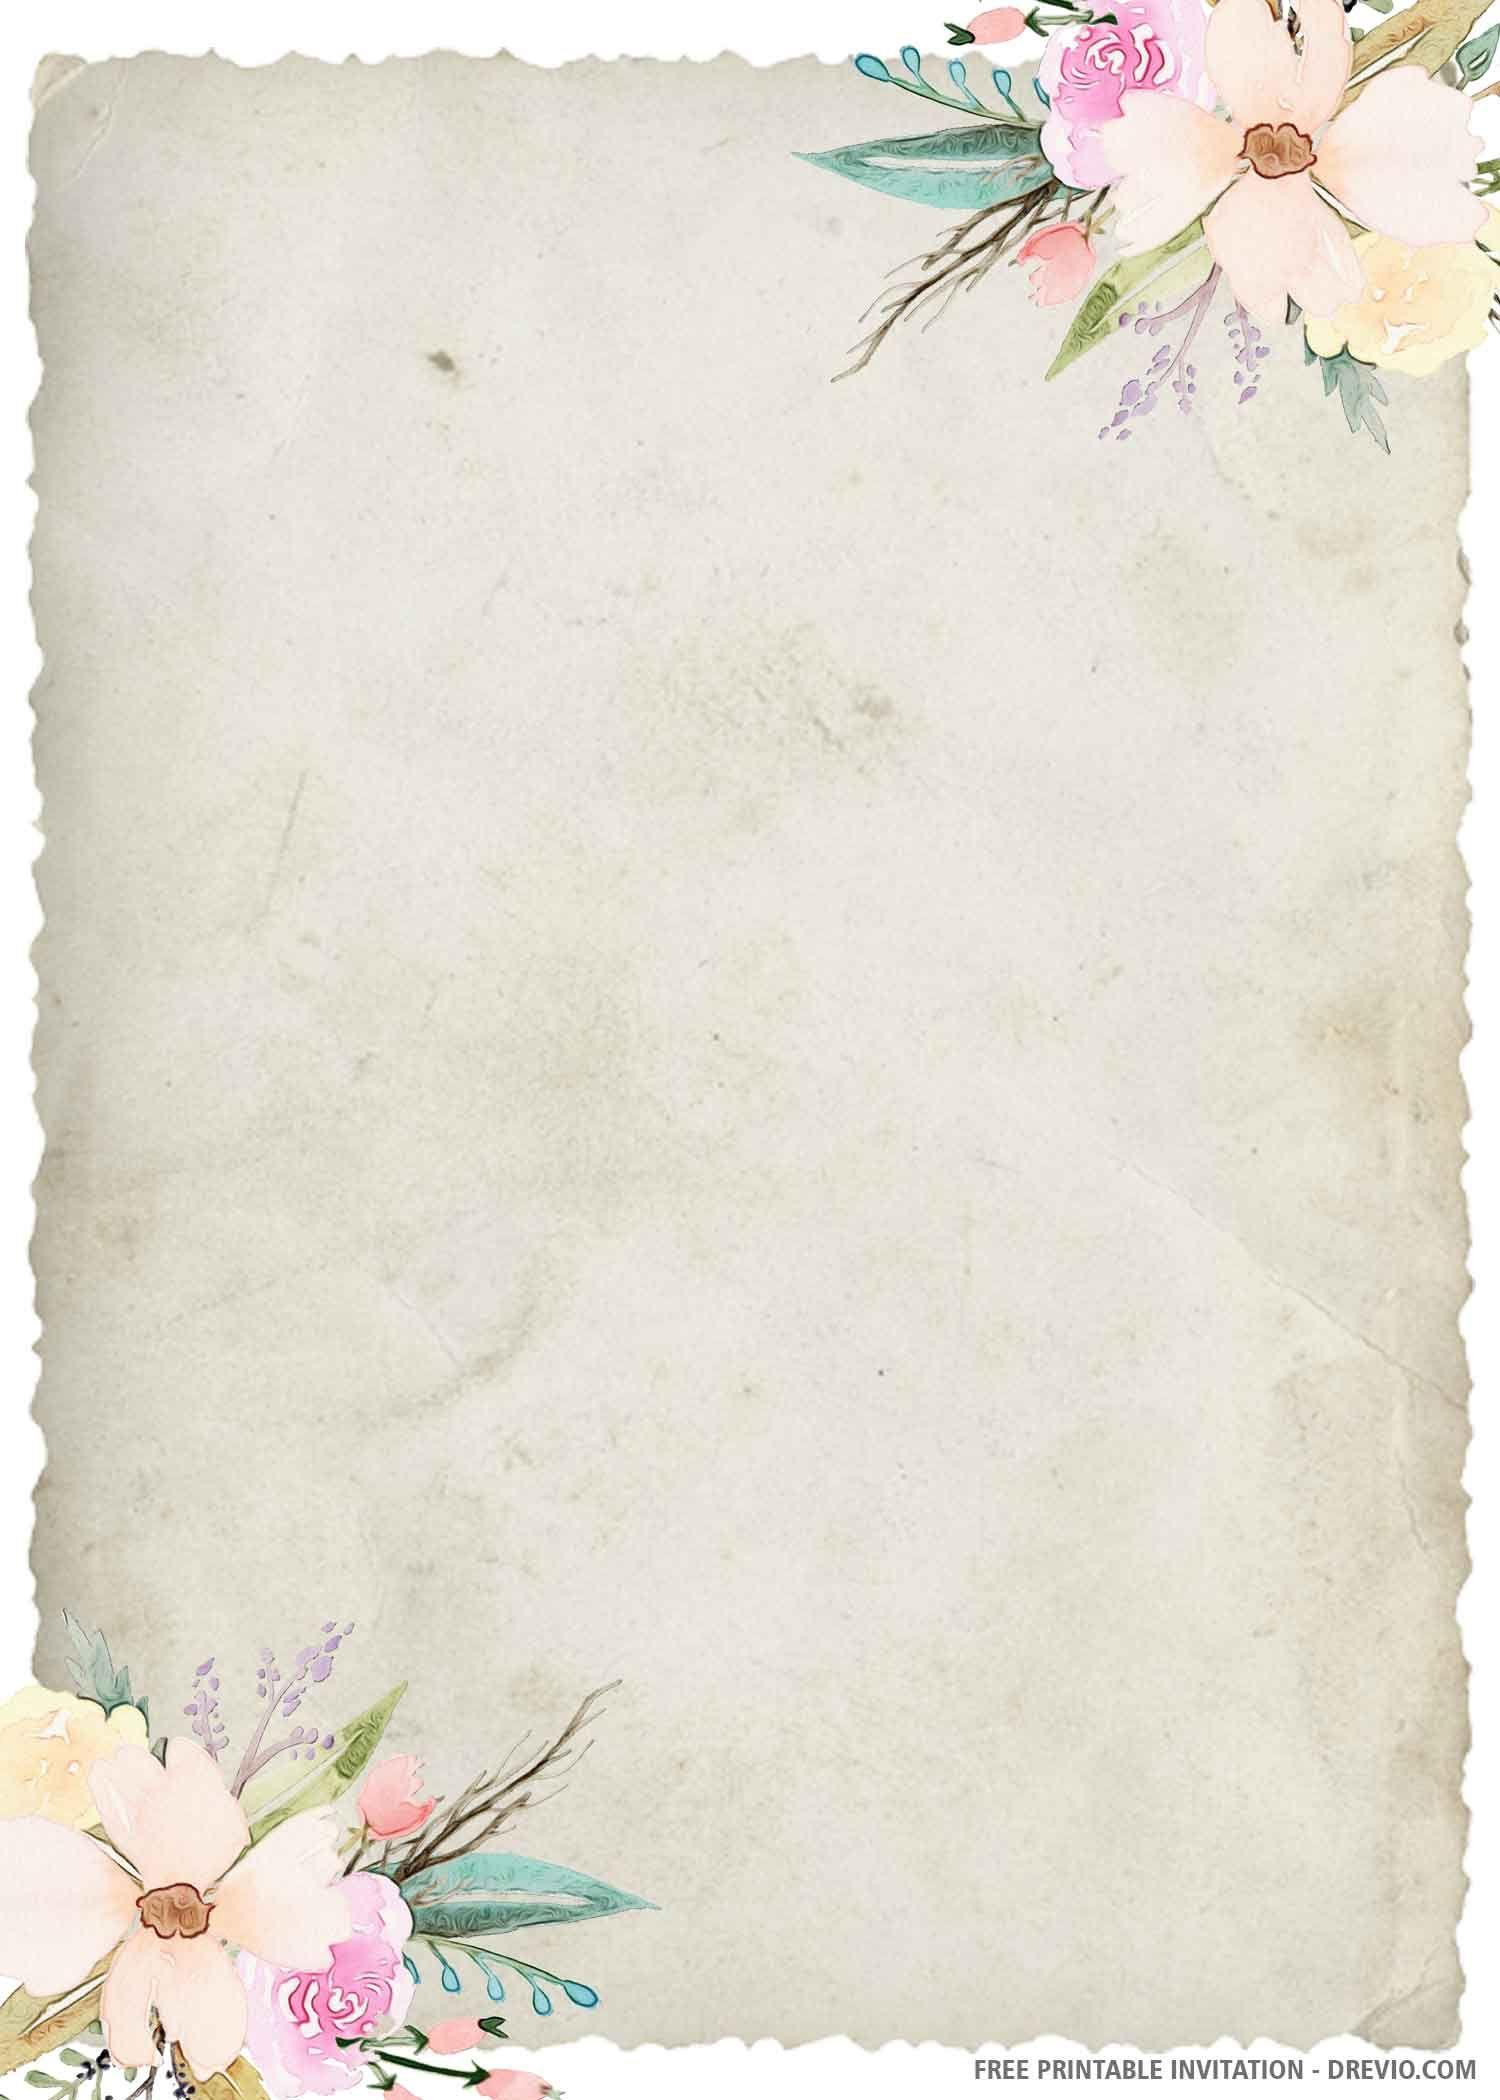 Free Printable Watercolor Greenery Boho Wedding Invitation